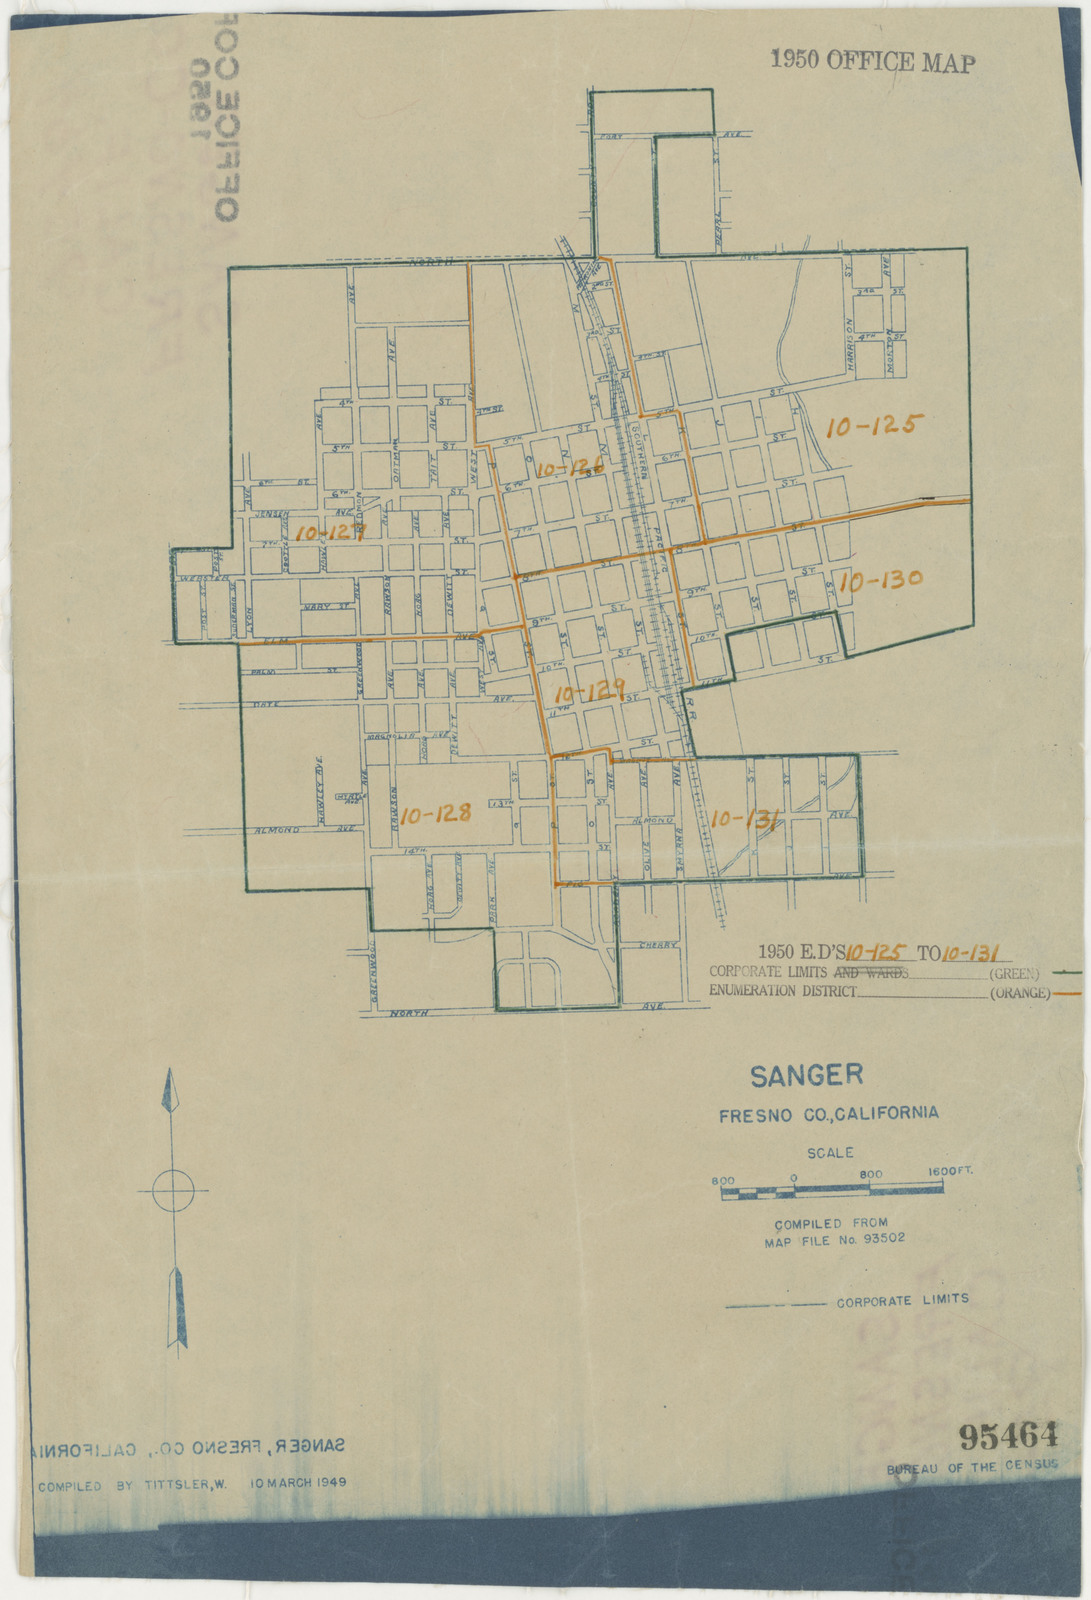 Map Of California Fresno.1950 Census Enumeration District Maps California Ca Fresno